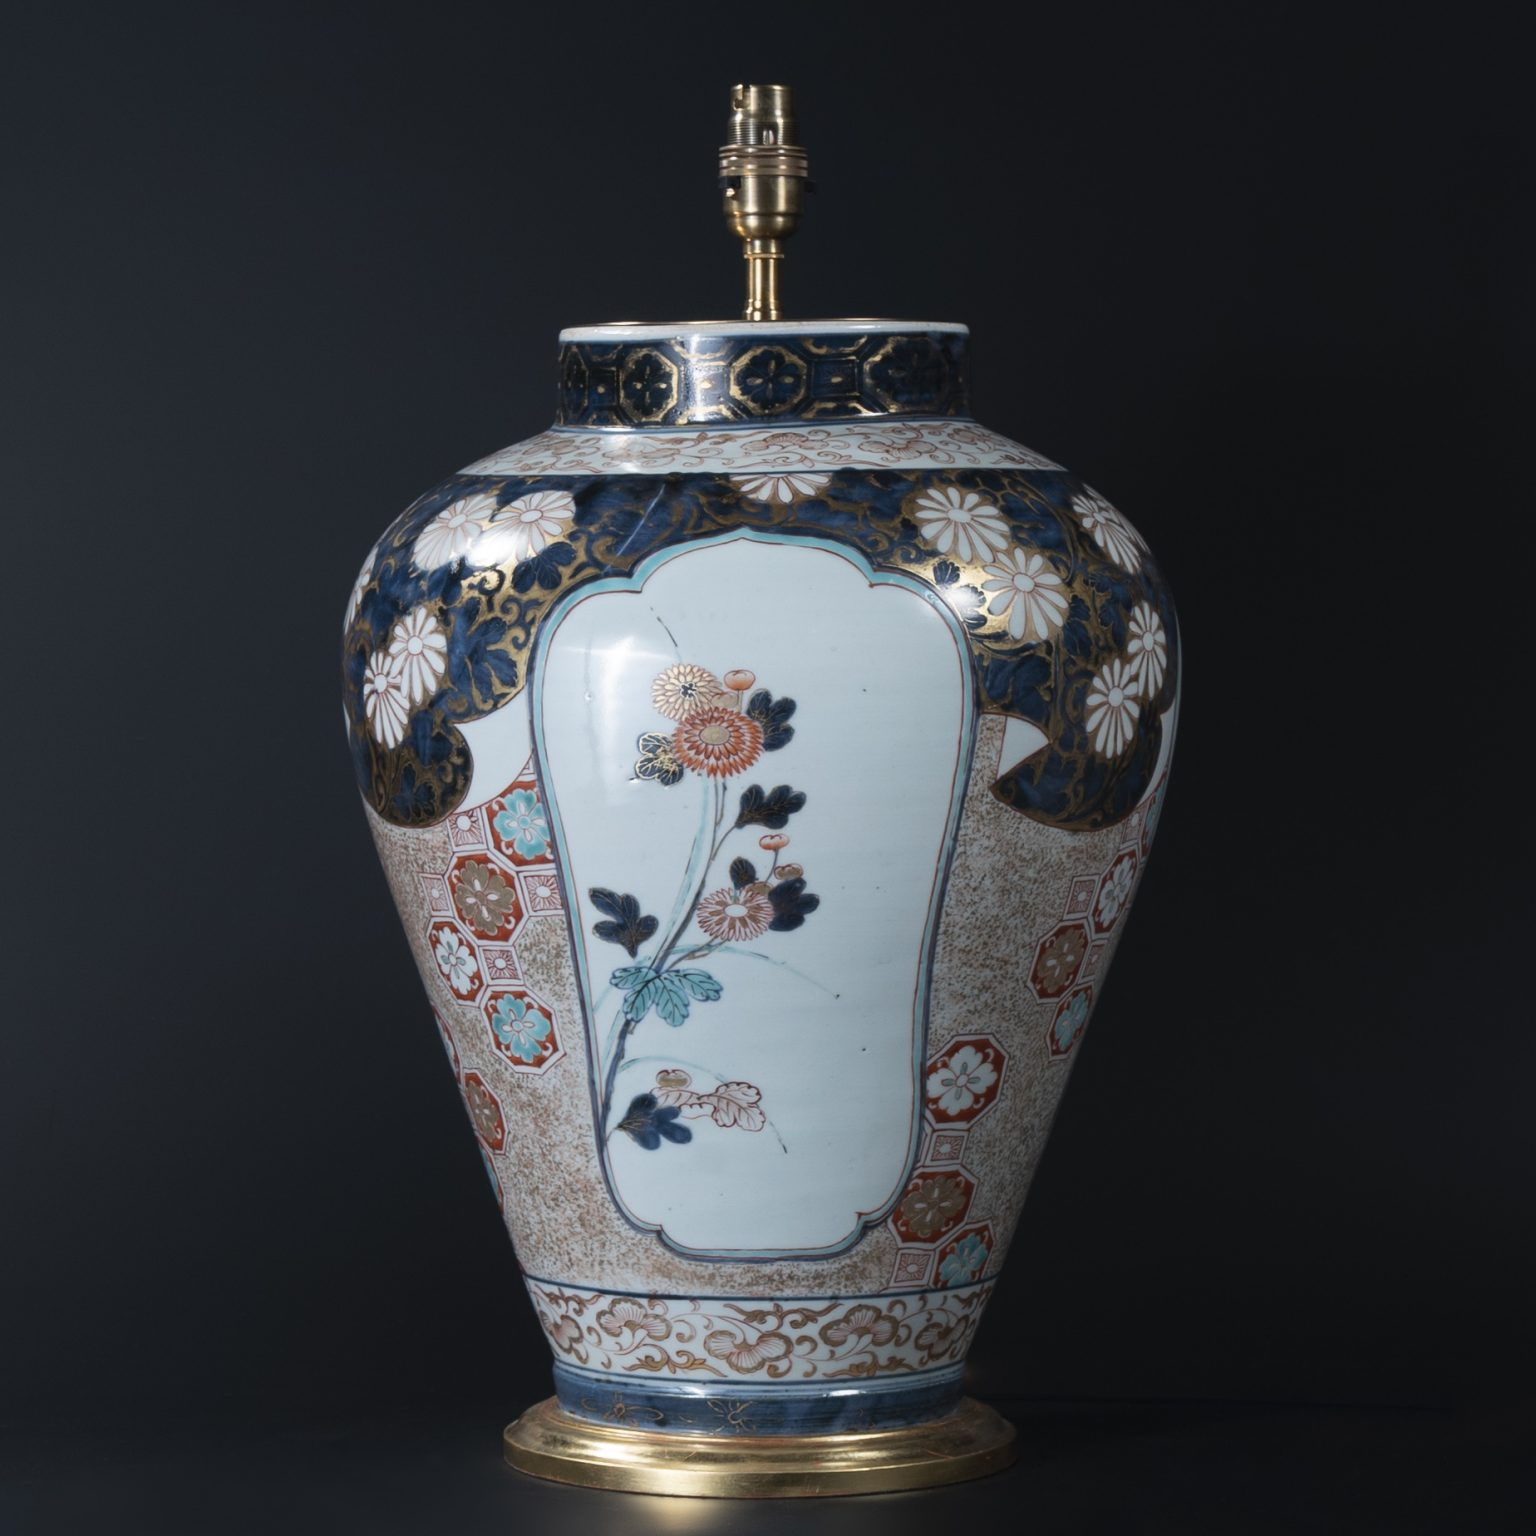 Rare 18th Century Japanese Imari Porcelain Vase as a Lamp